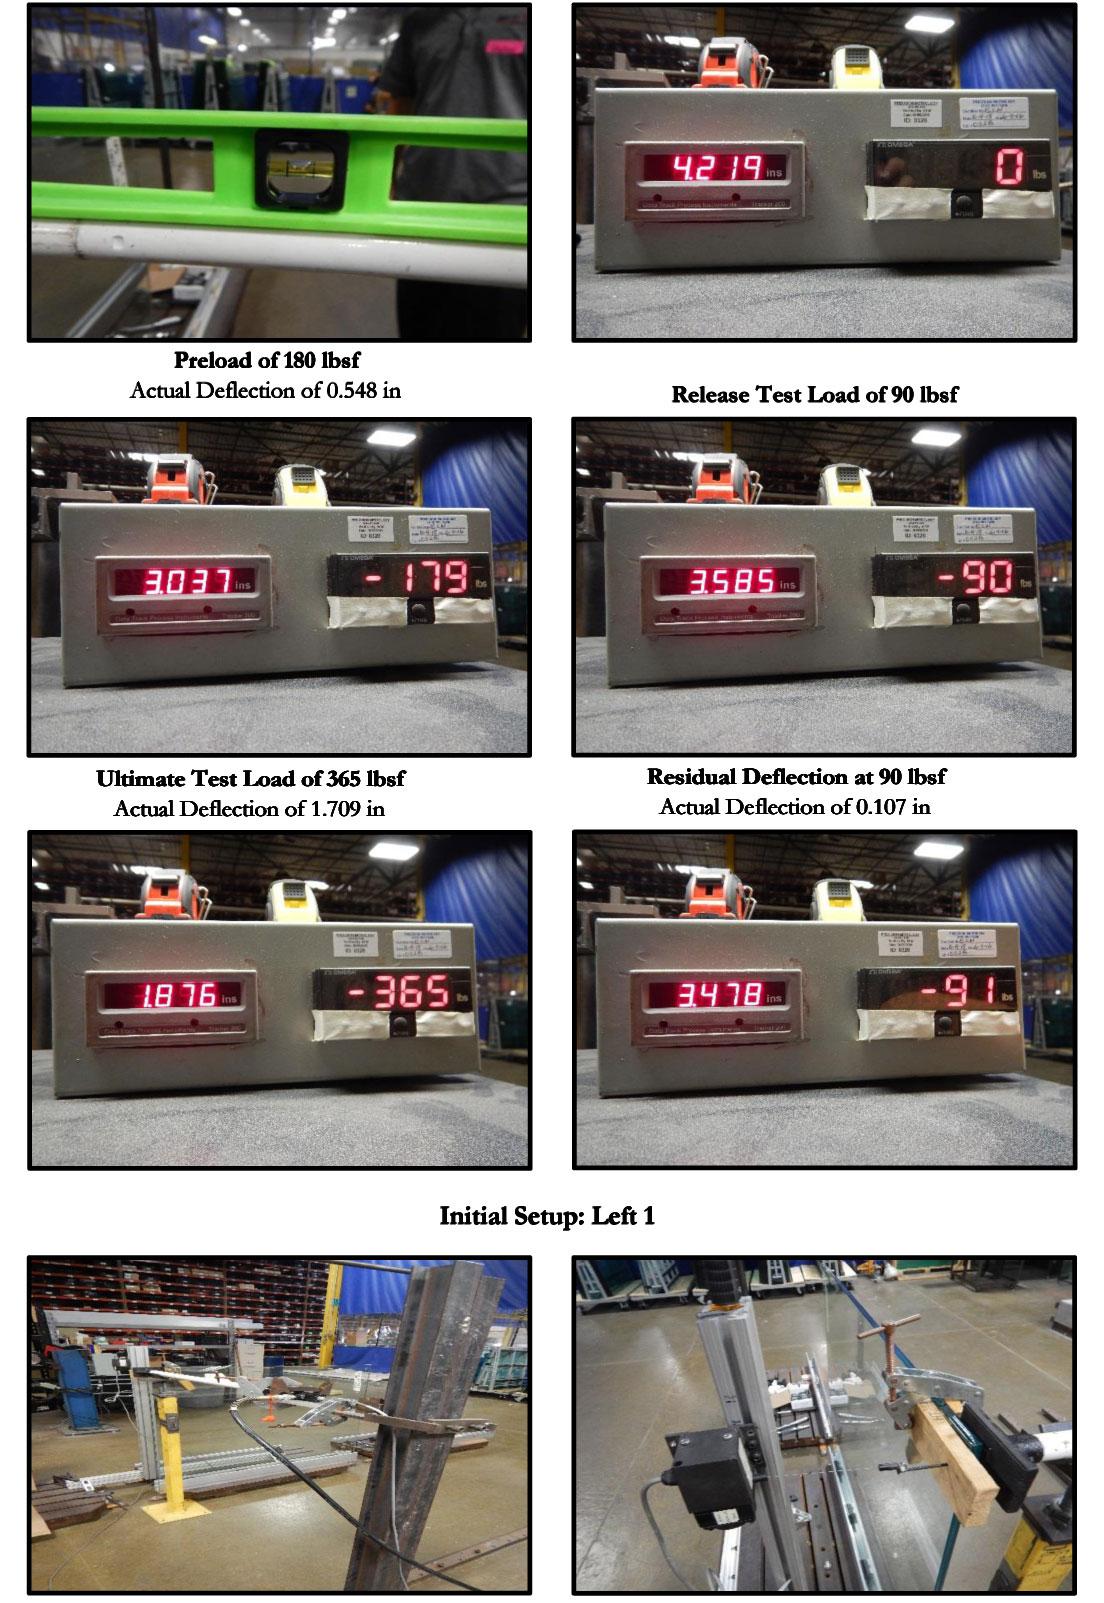 tr002-05-0.5-sgp-astme985-deflectiontest.jpg